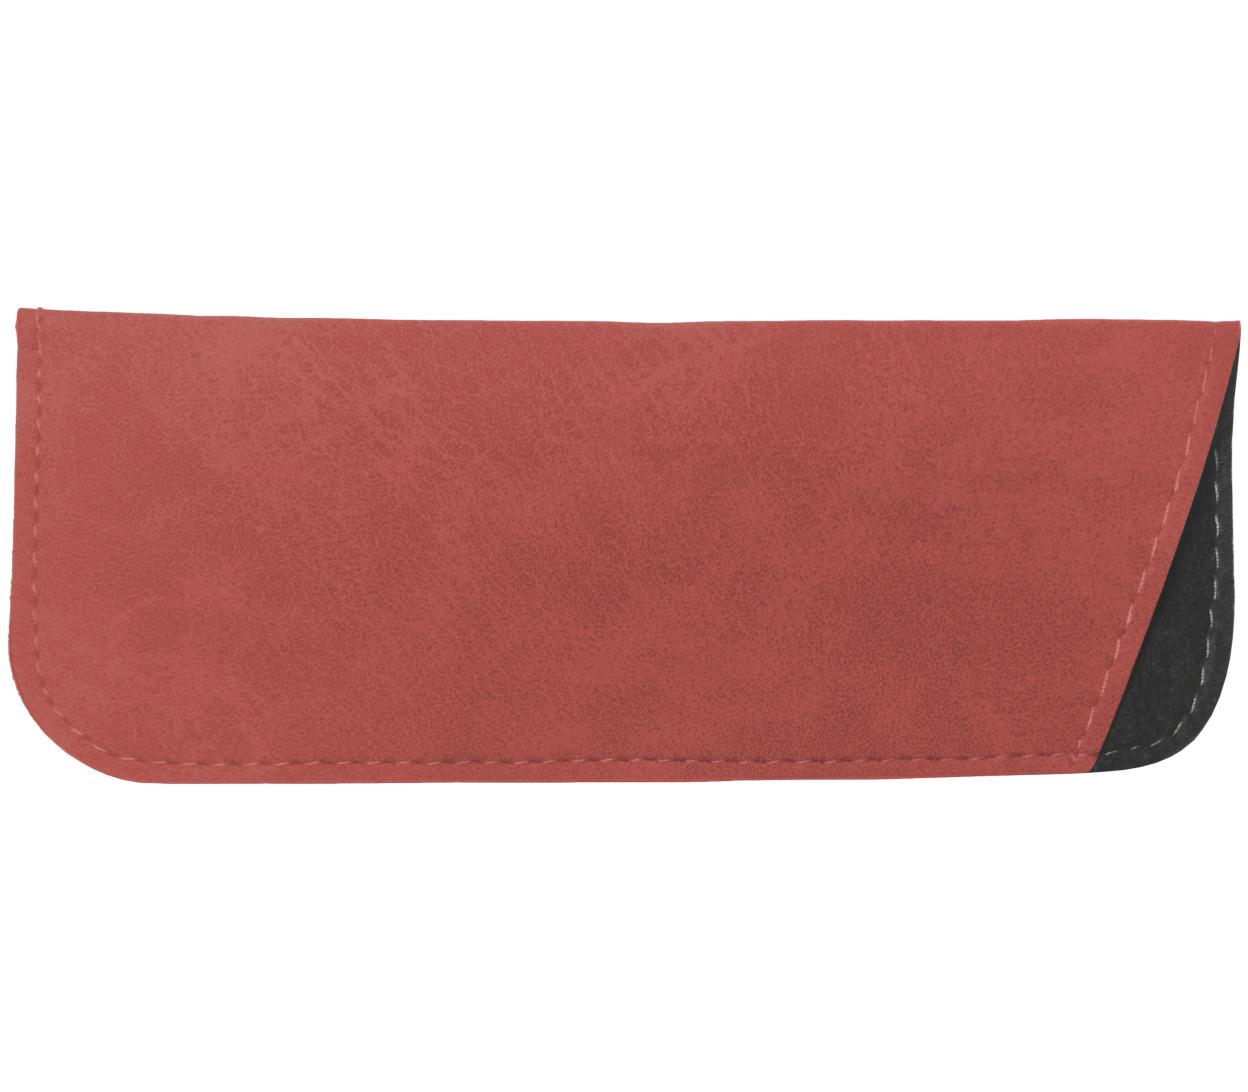 Case - Aspen (Red)